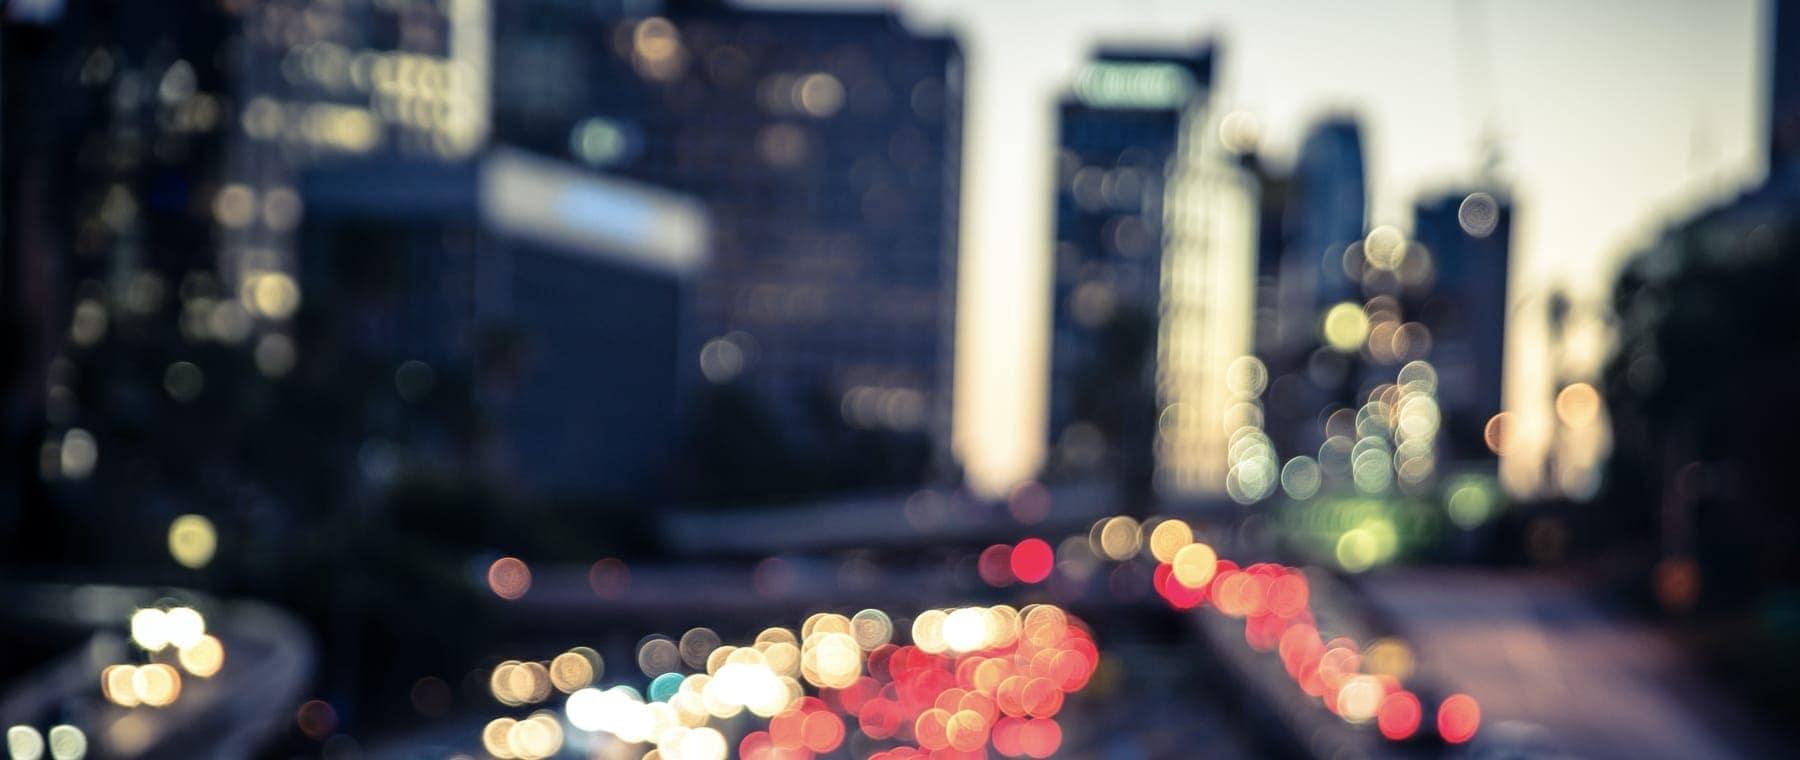 Blurry city street at dusk